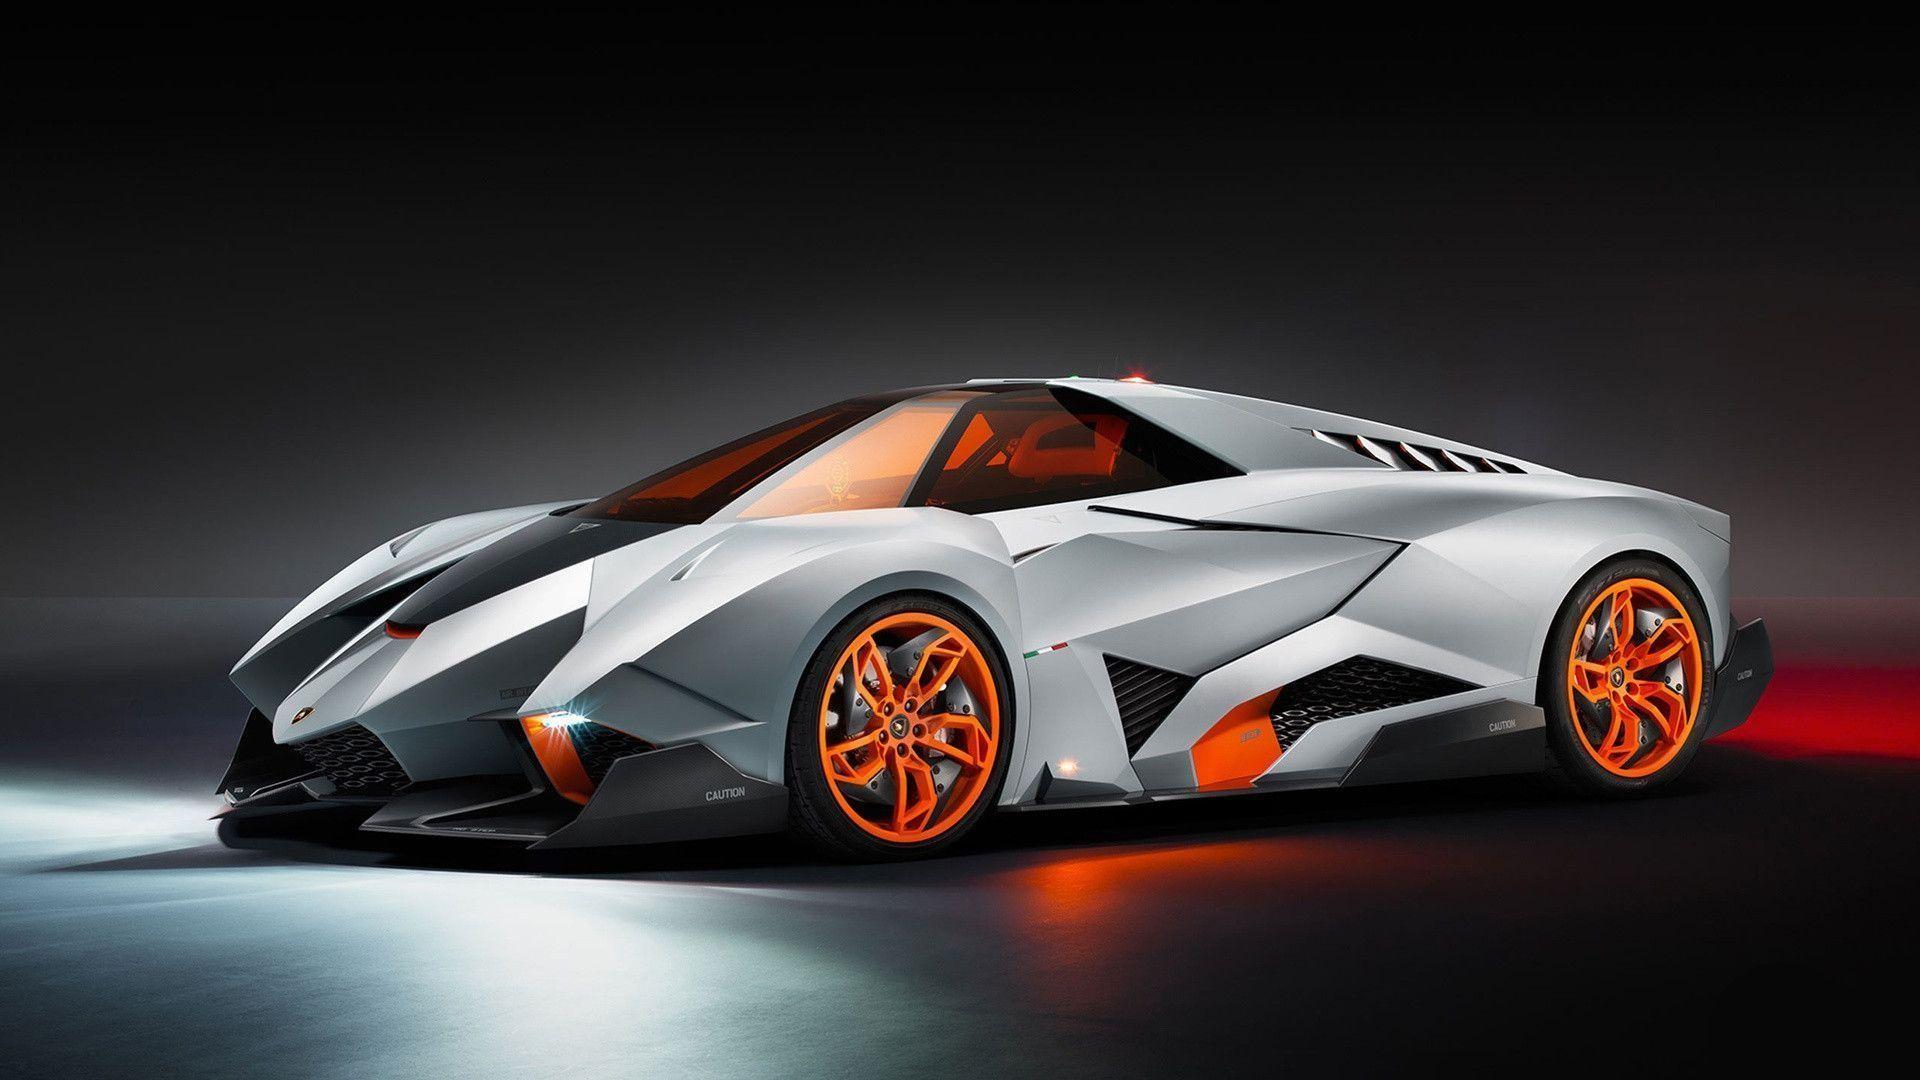 Wallpaper Full Hd 1080p Lamborghini New 2018 79 Images